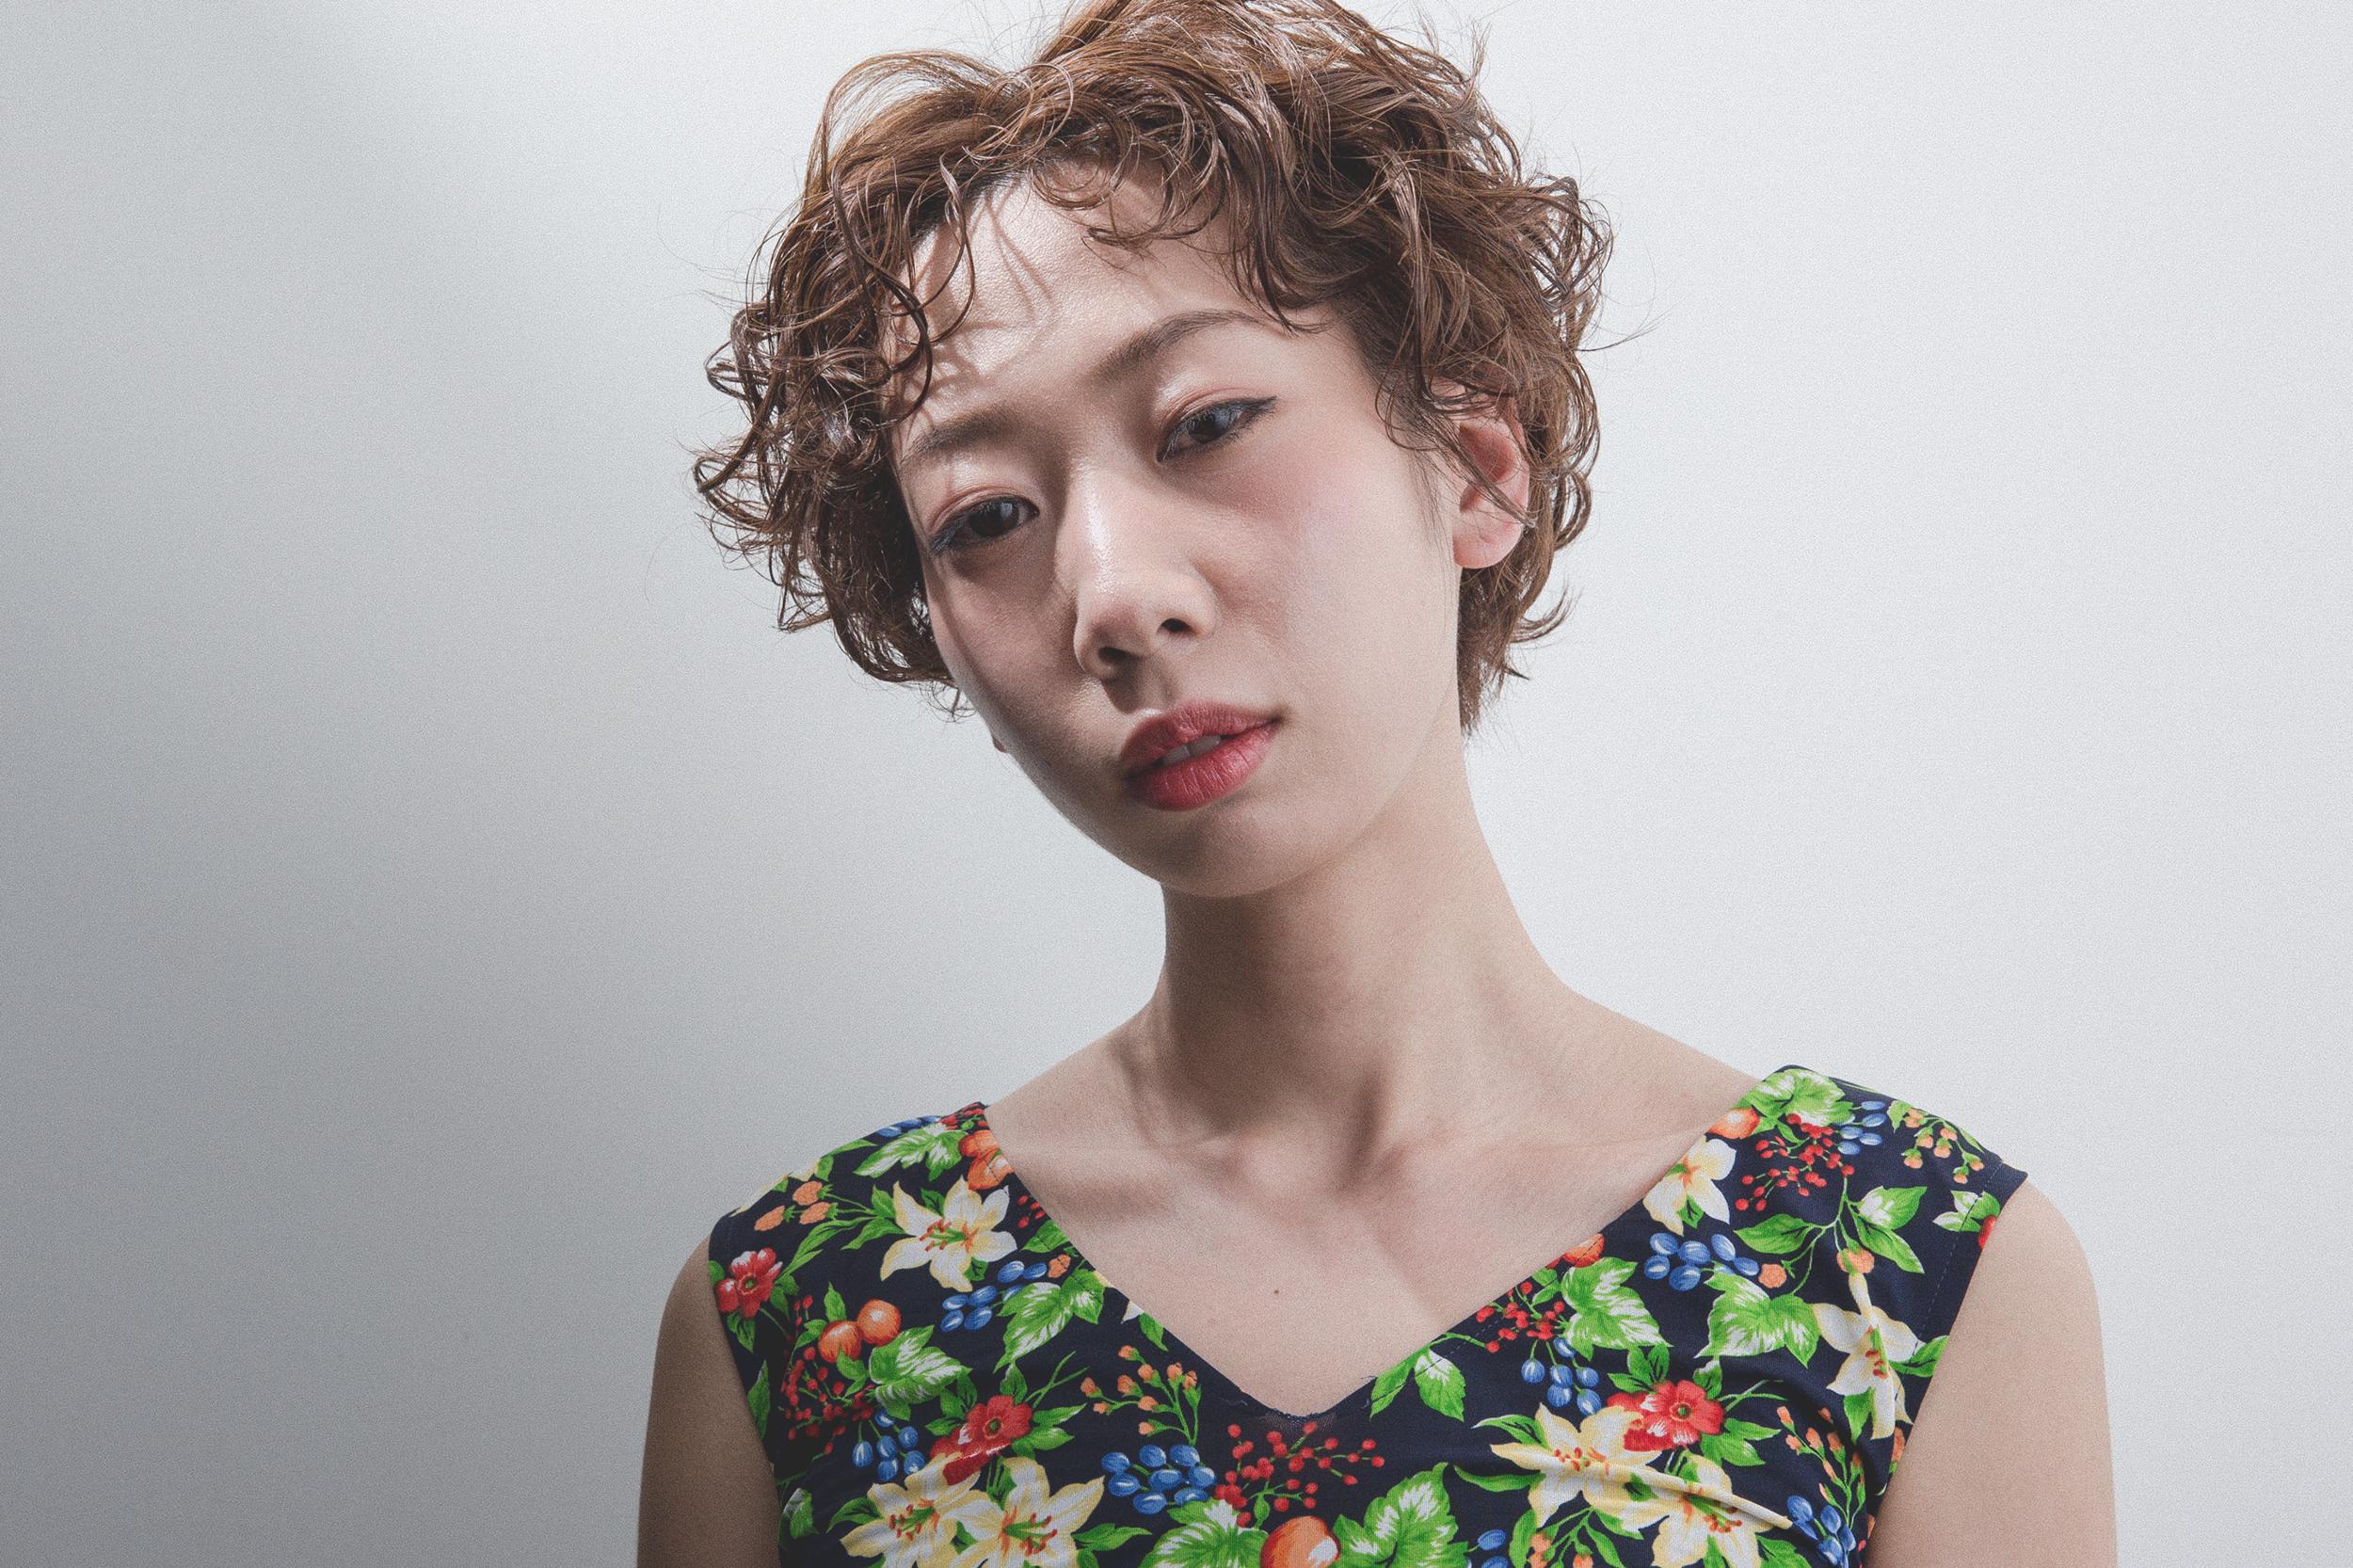 ayame_yako-6115.jpg